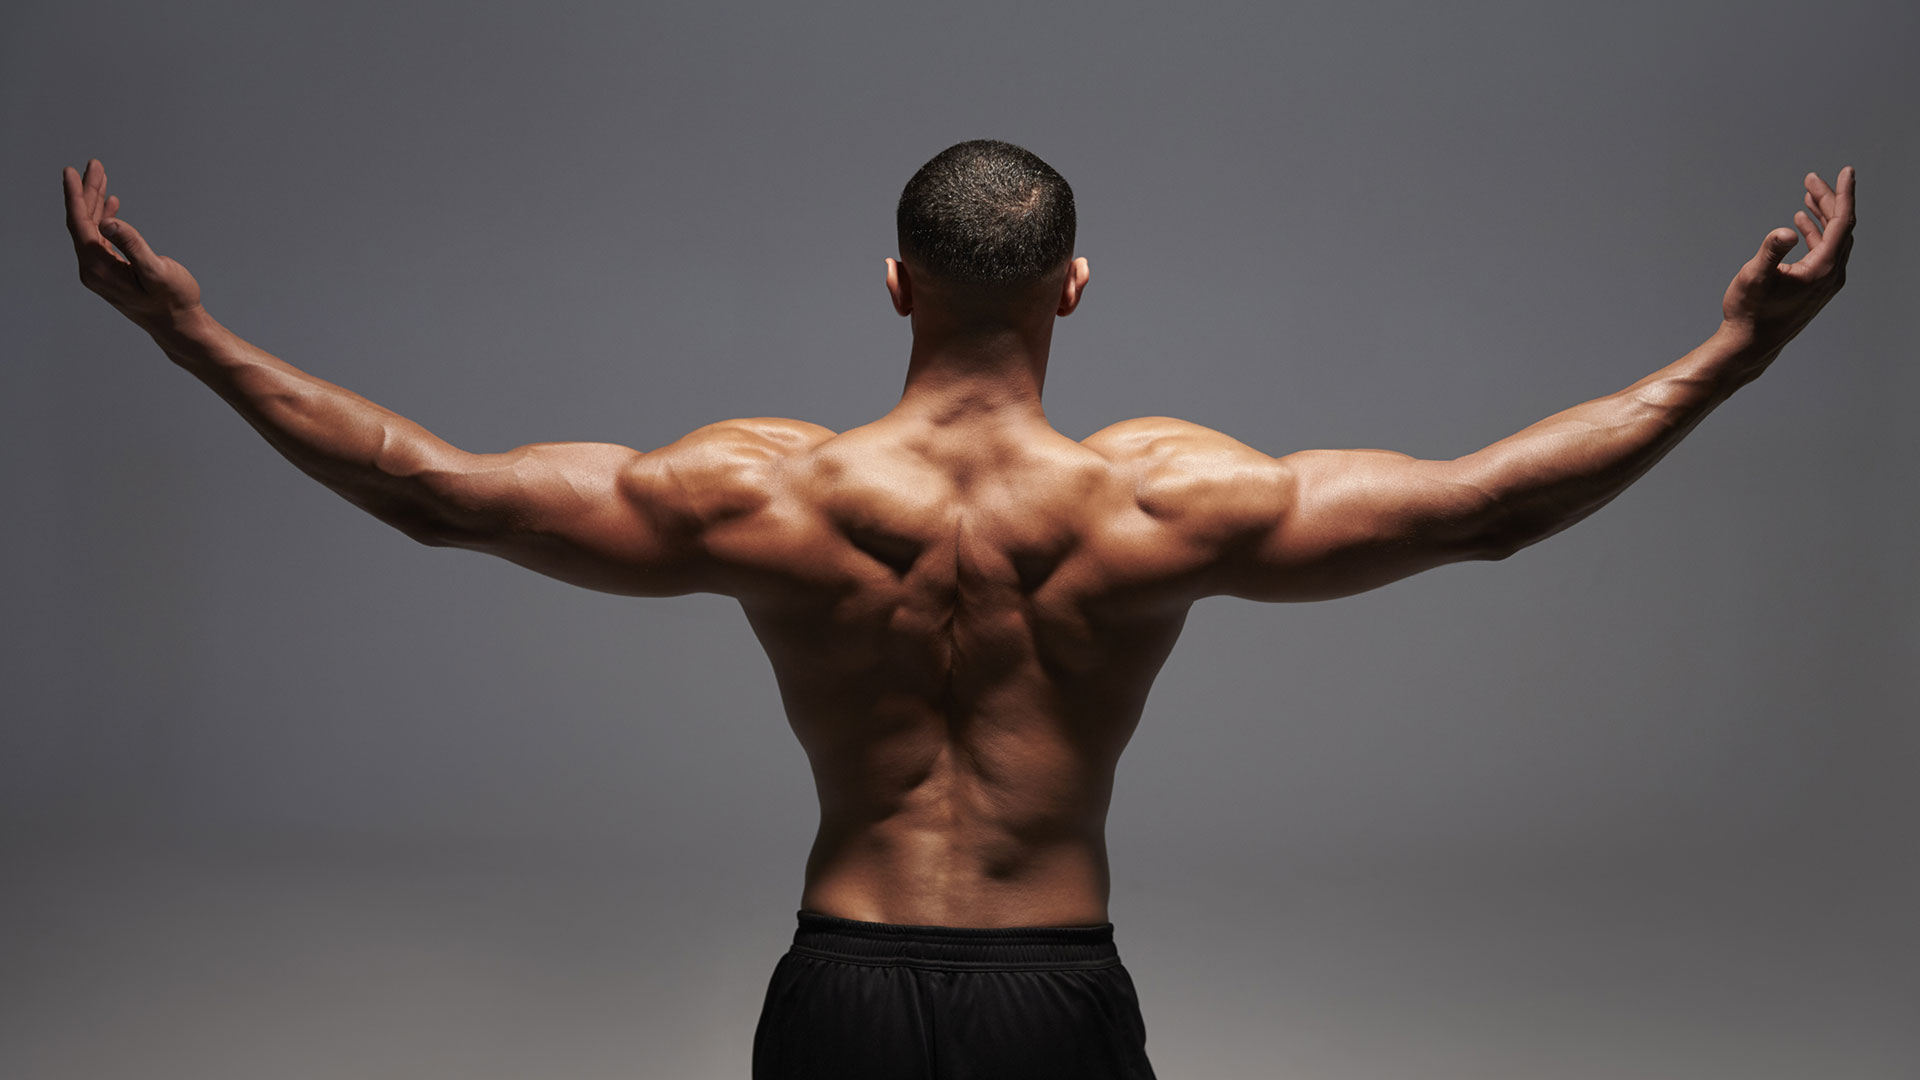 schouderbladen trainen